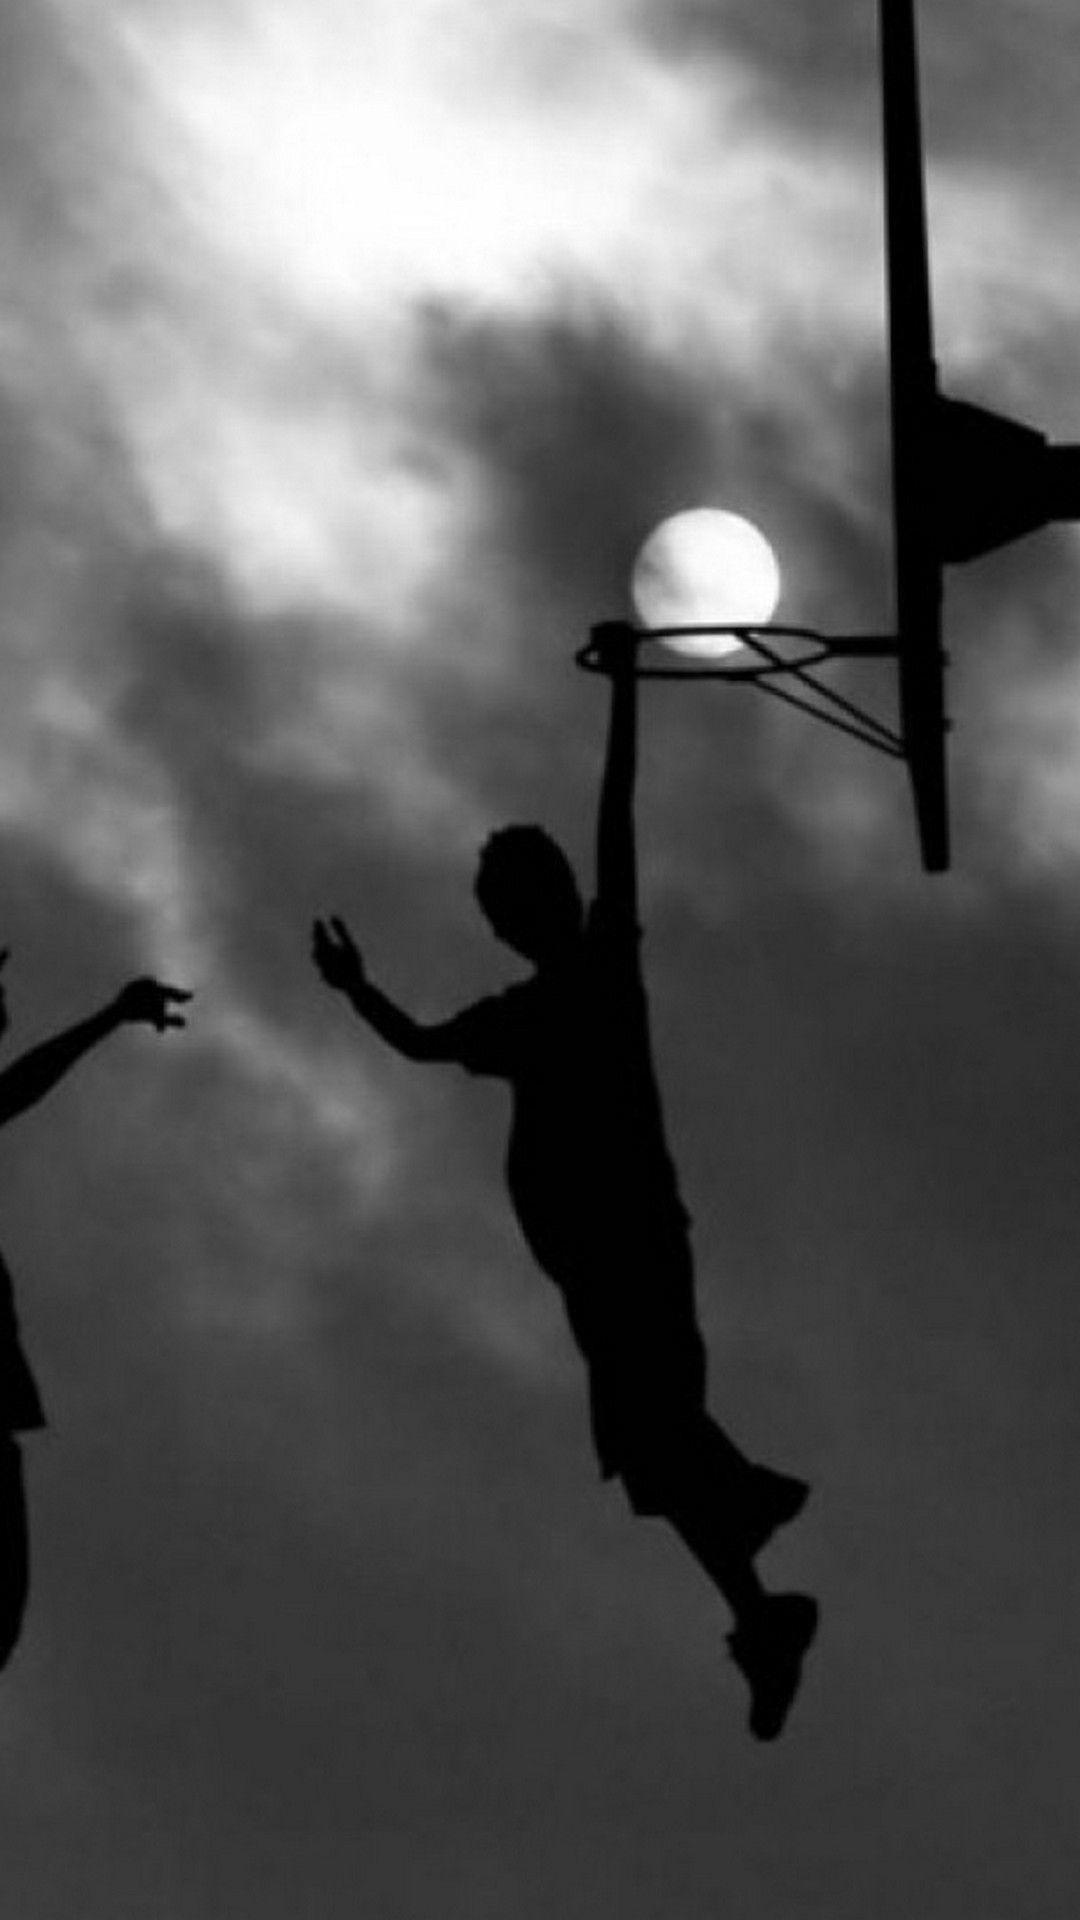 Basketball iPhone 7 Wallpaper Iphone 7 wallpapers